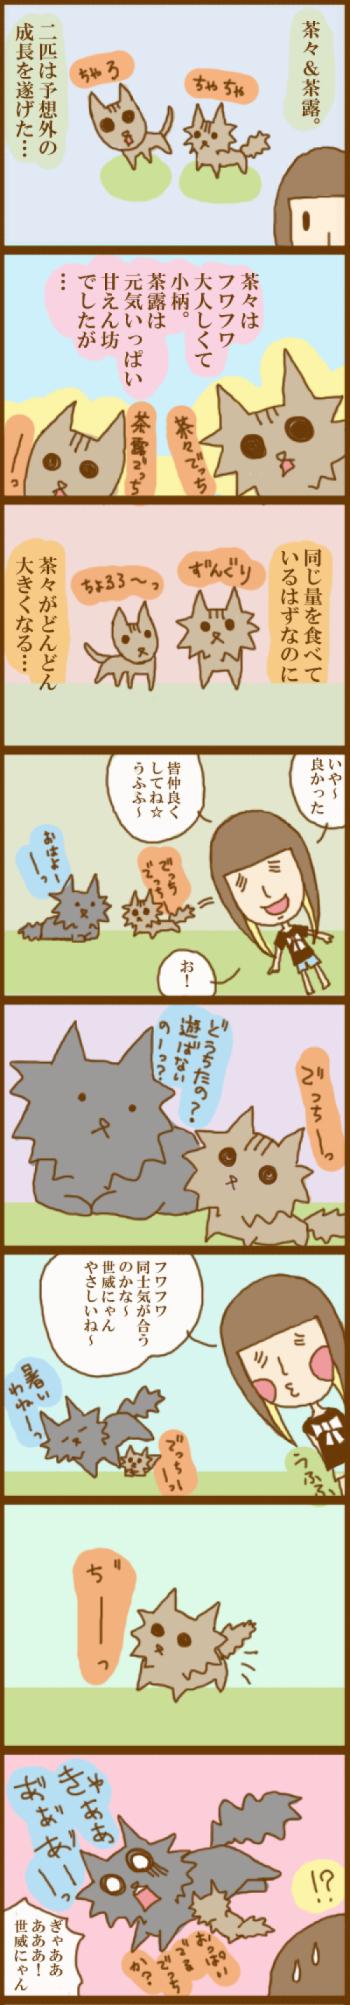 f:id:suzuokayu:20201123102023j:plain